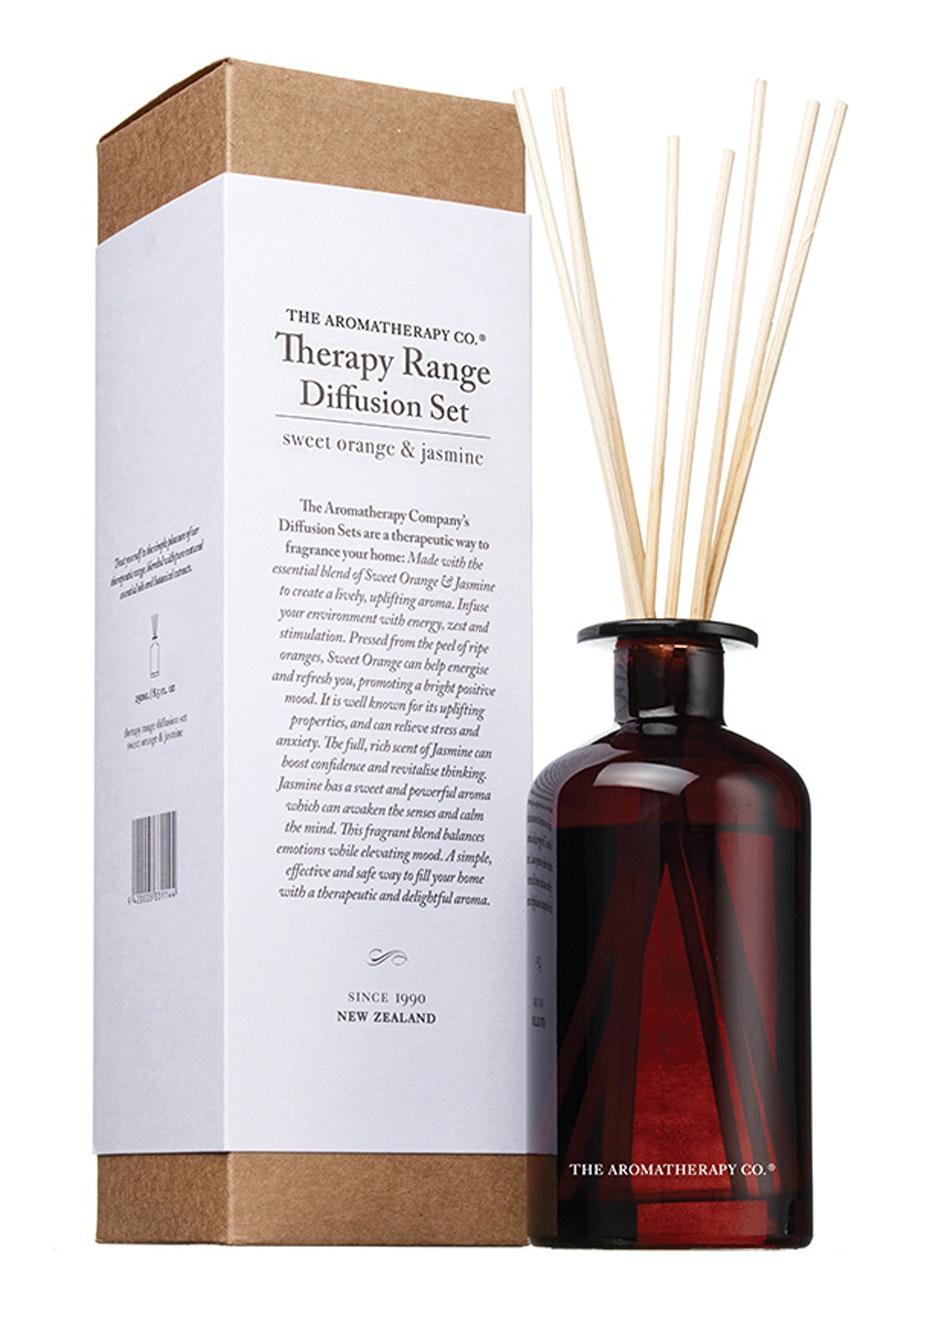 The Aromatherapy Co.  Therapy Diffusion set - Sweet Orange & Jasmine - 250ml